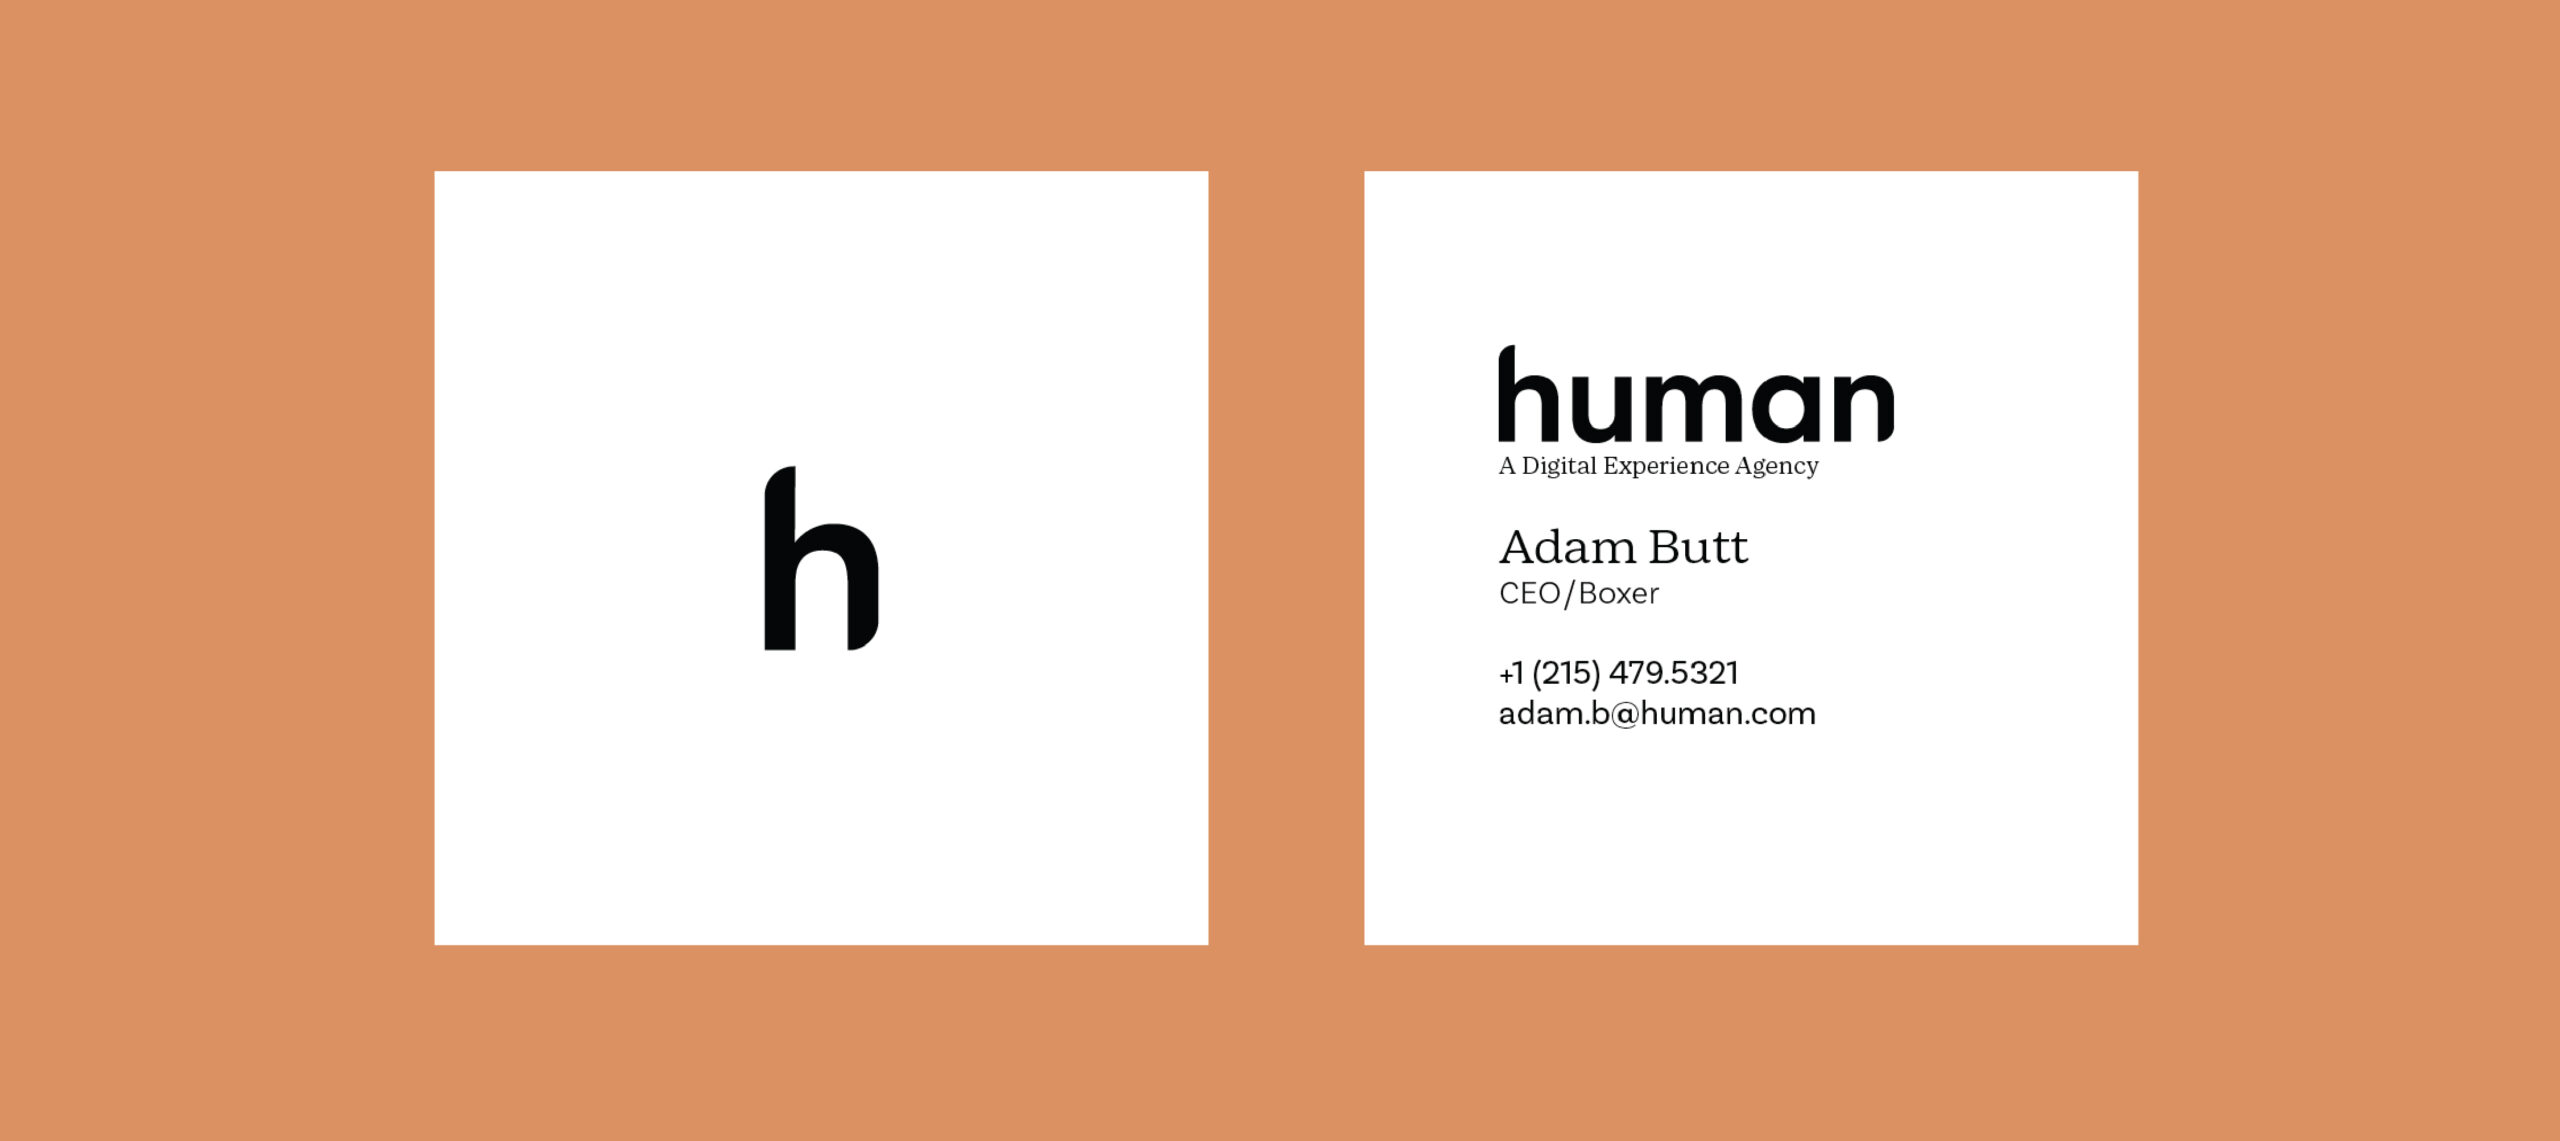 Human_Branding_By_Stellen_Design-10